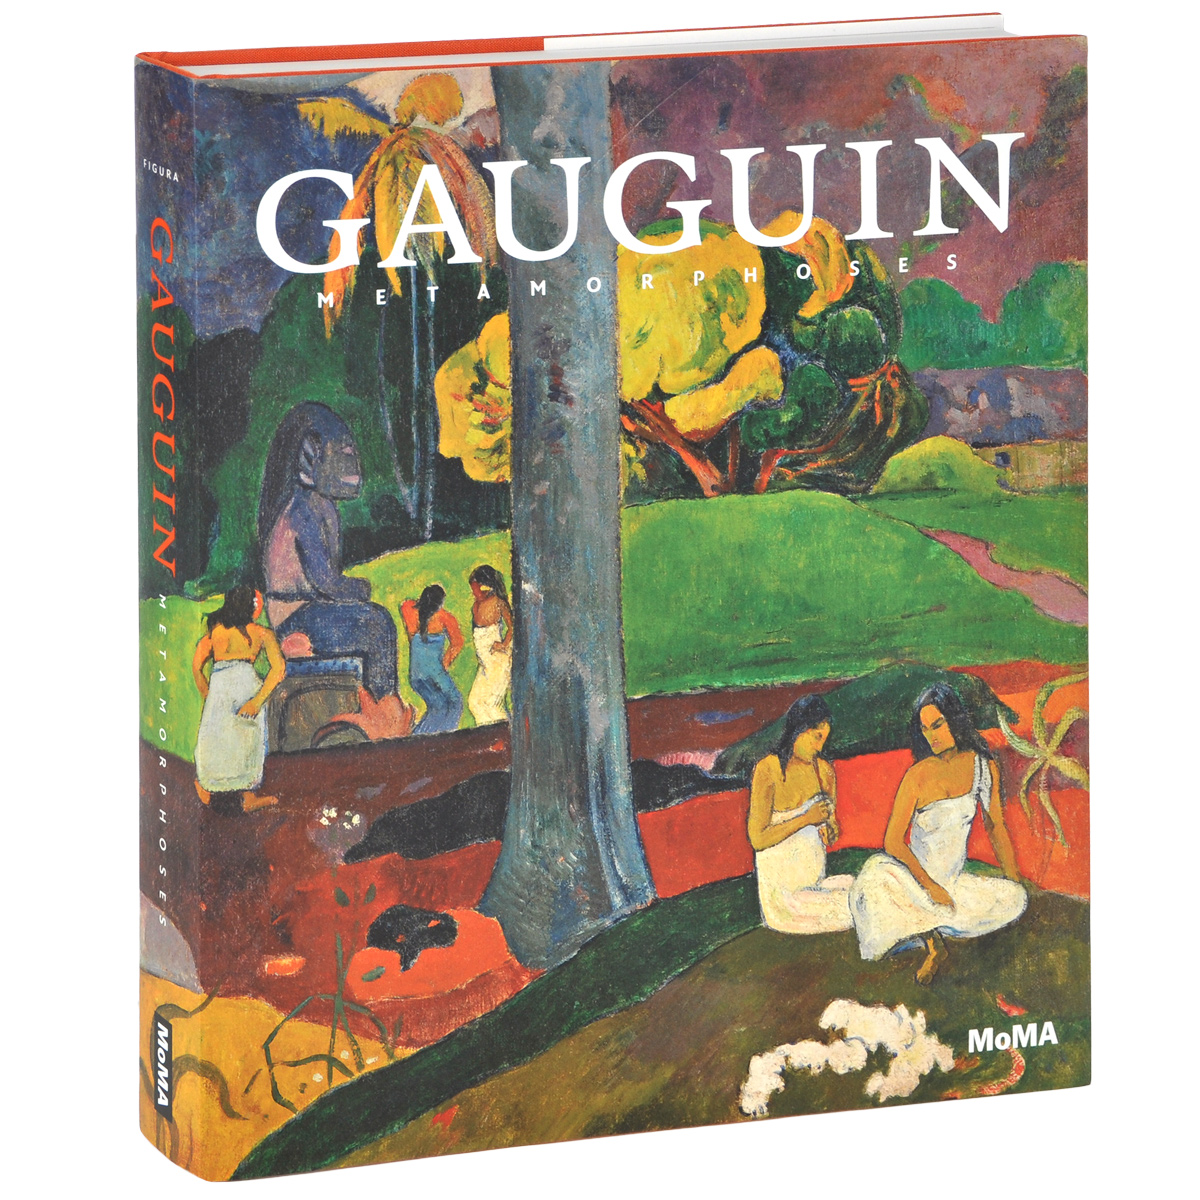 Gauguin: Metamorphoses gauguin the other world